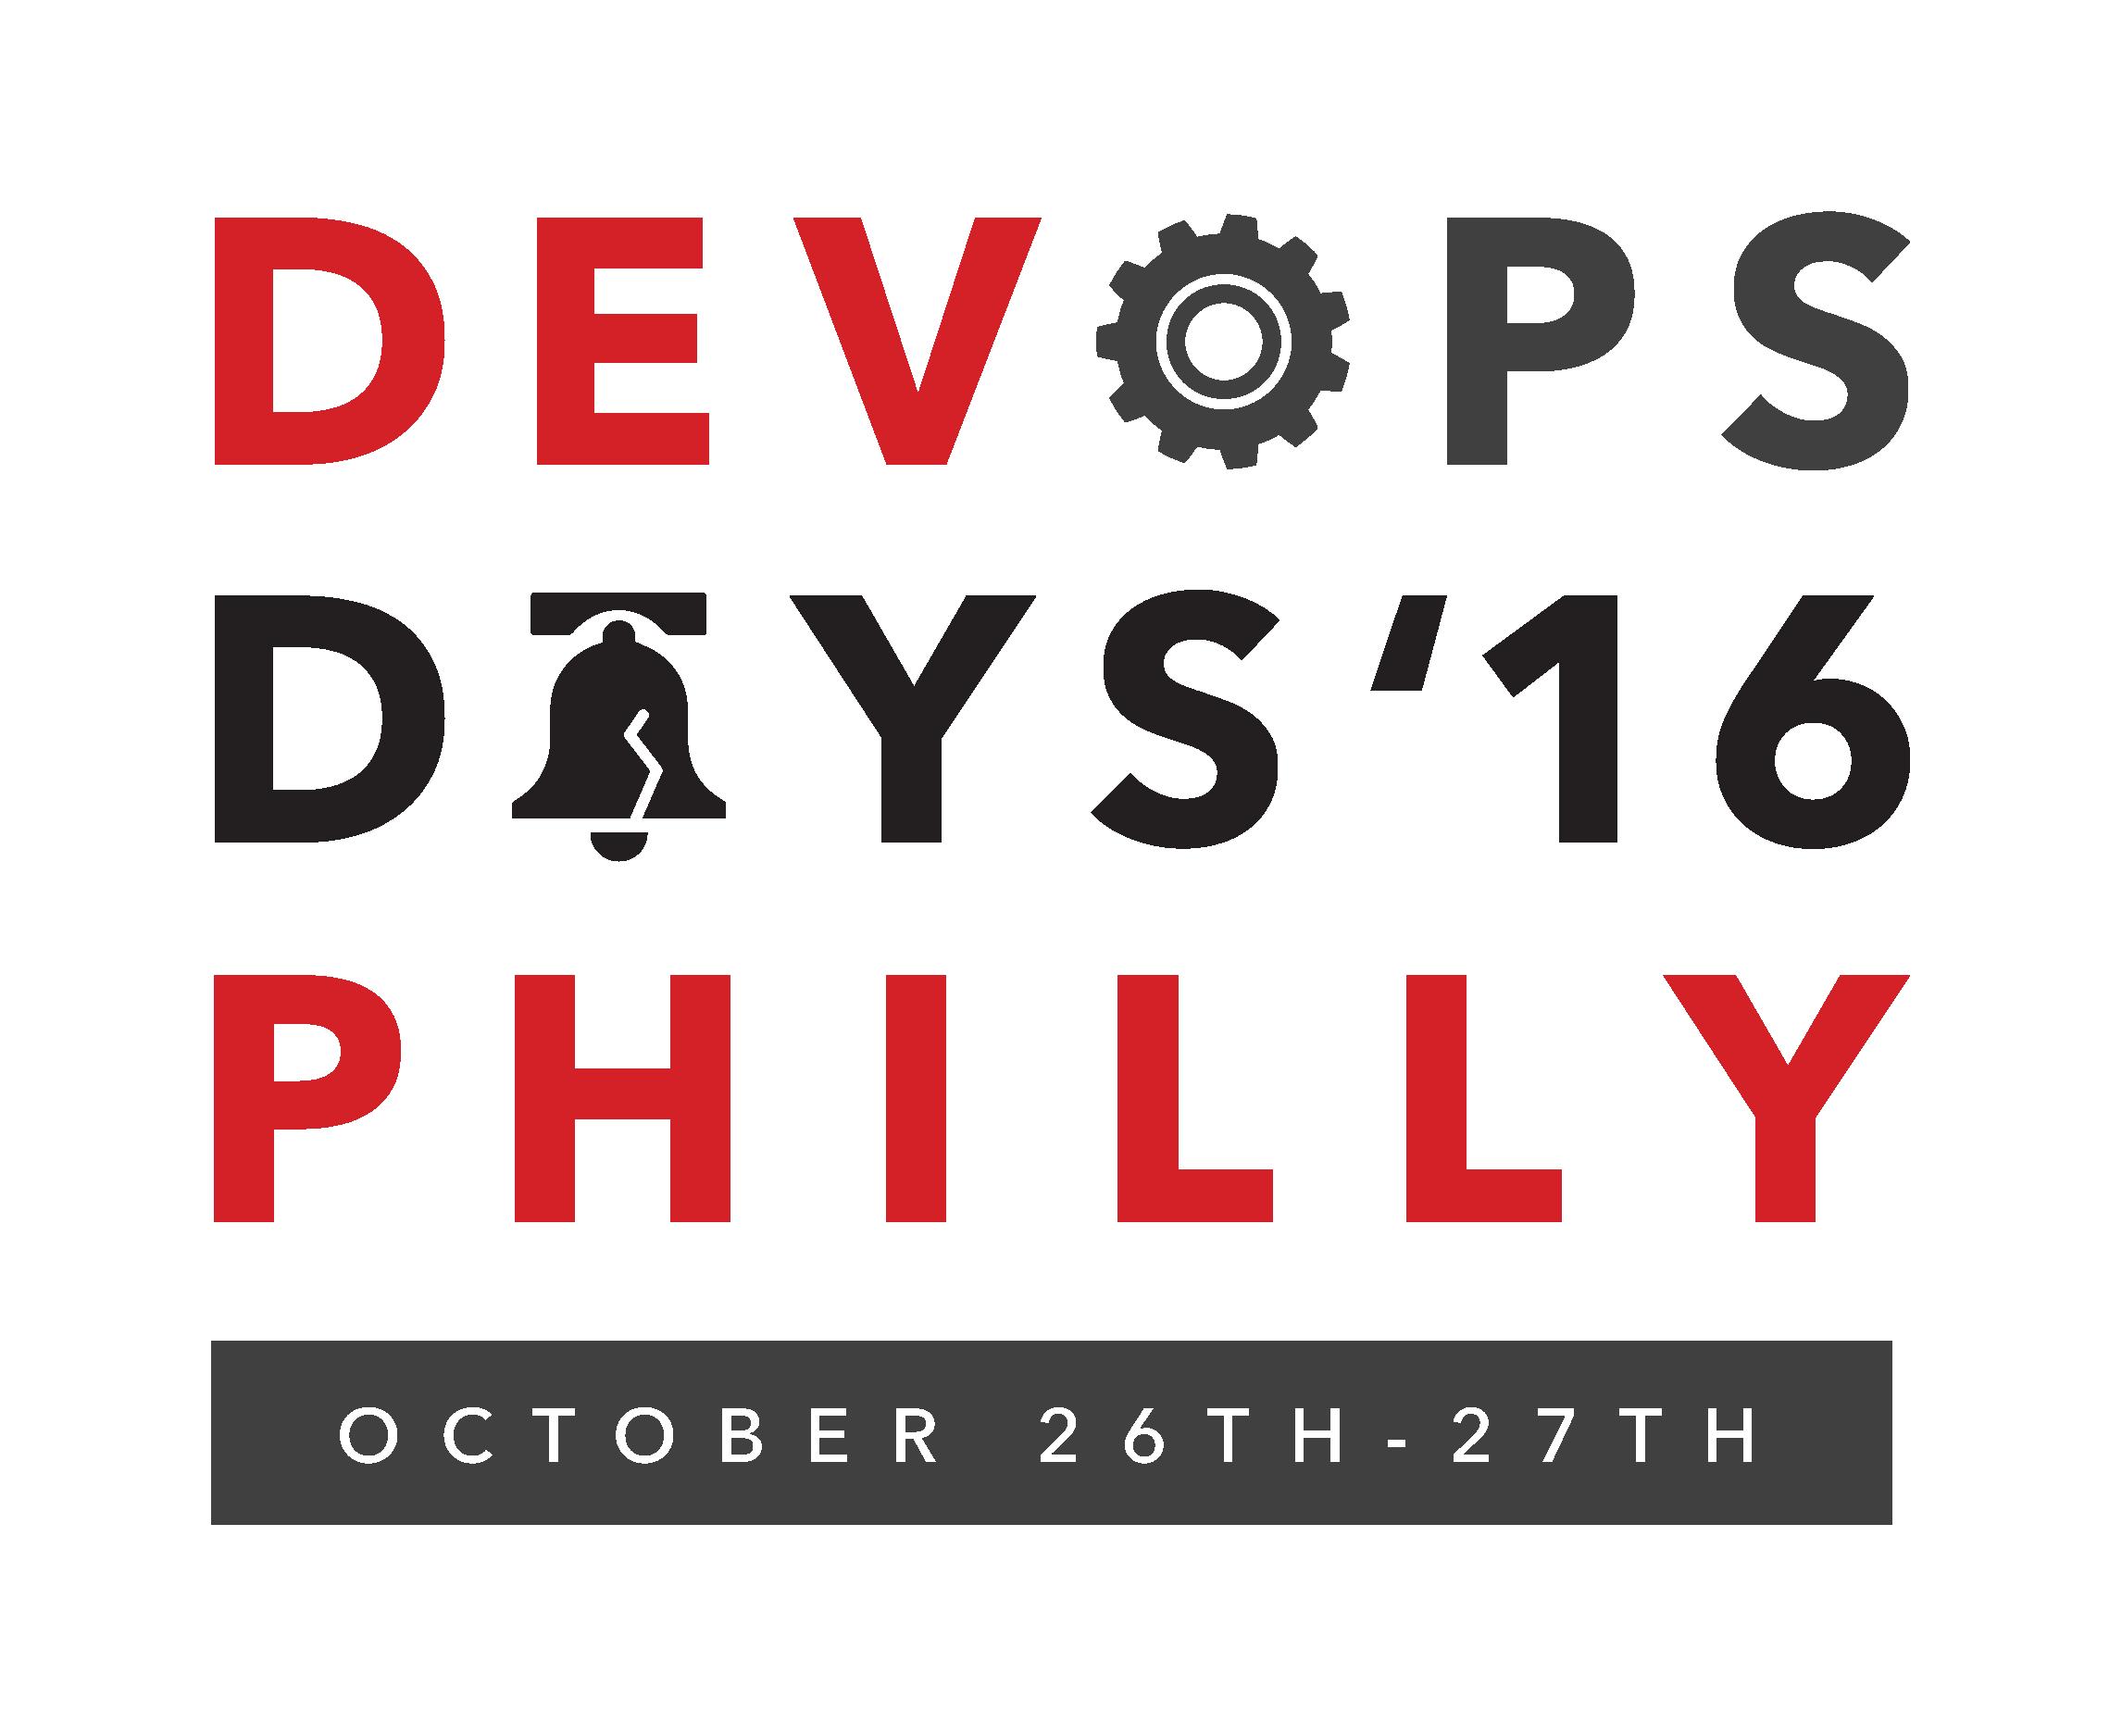 devopsdays Philadelphia 2016